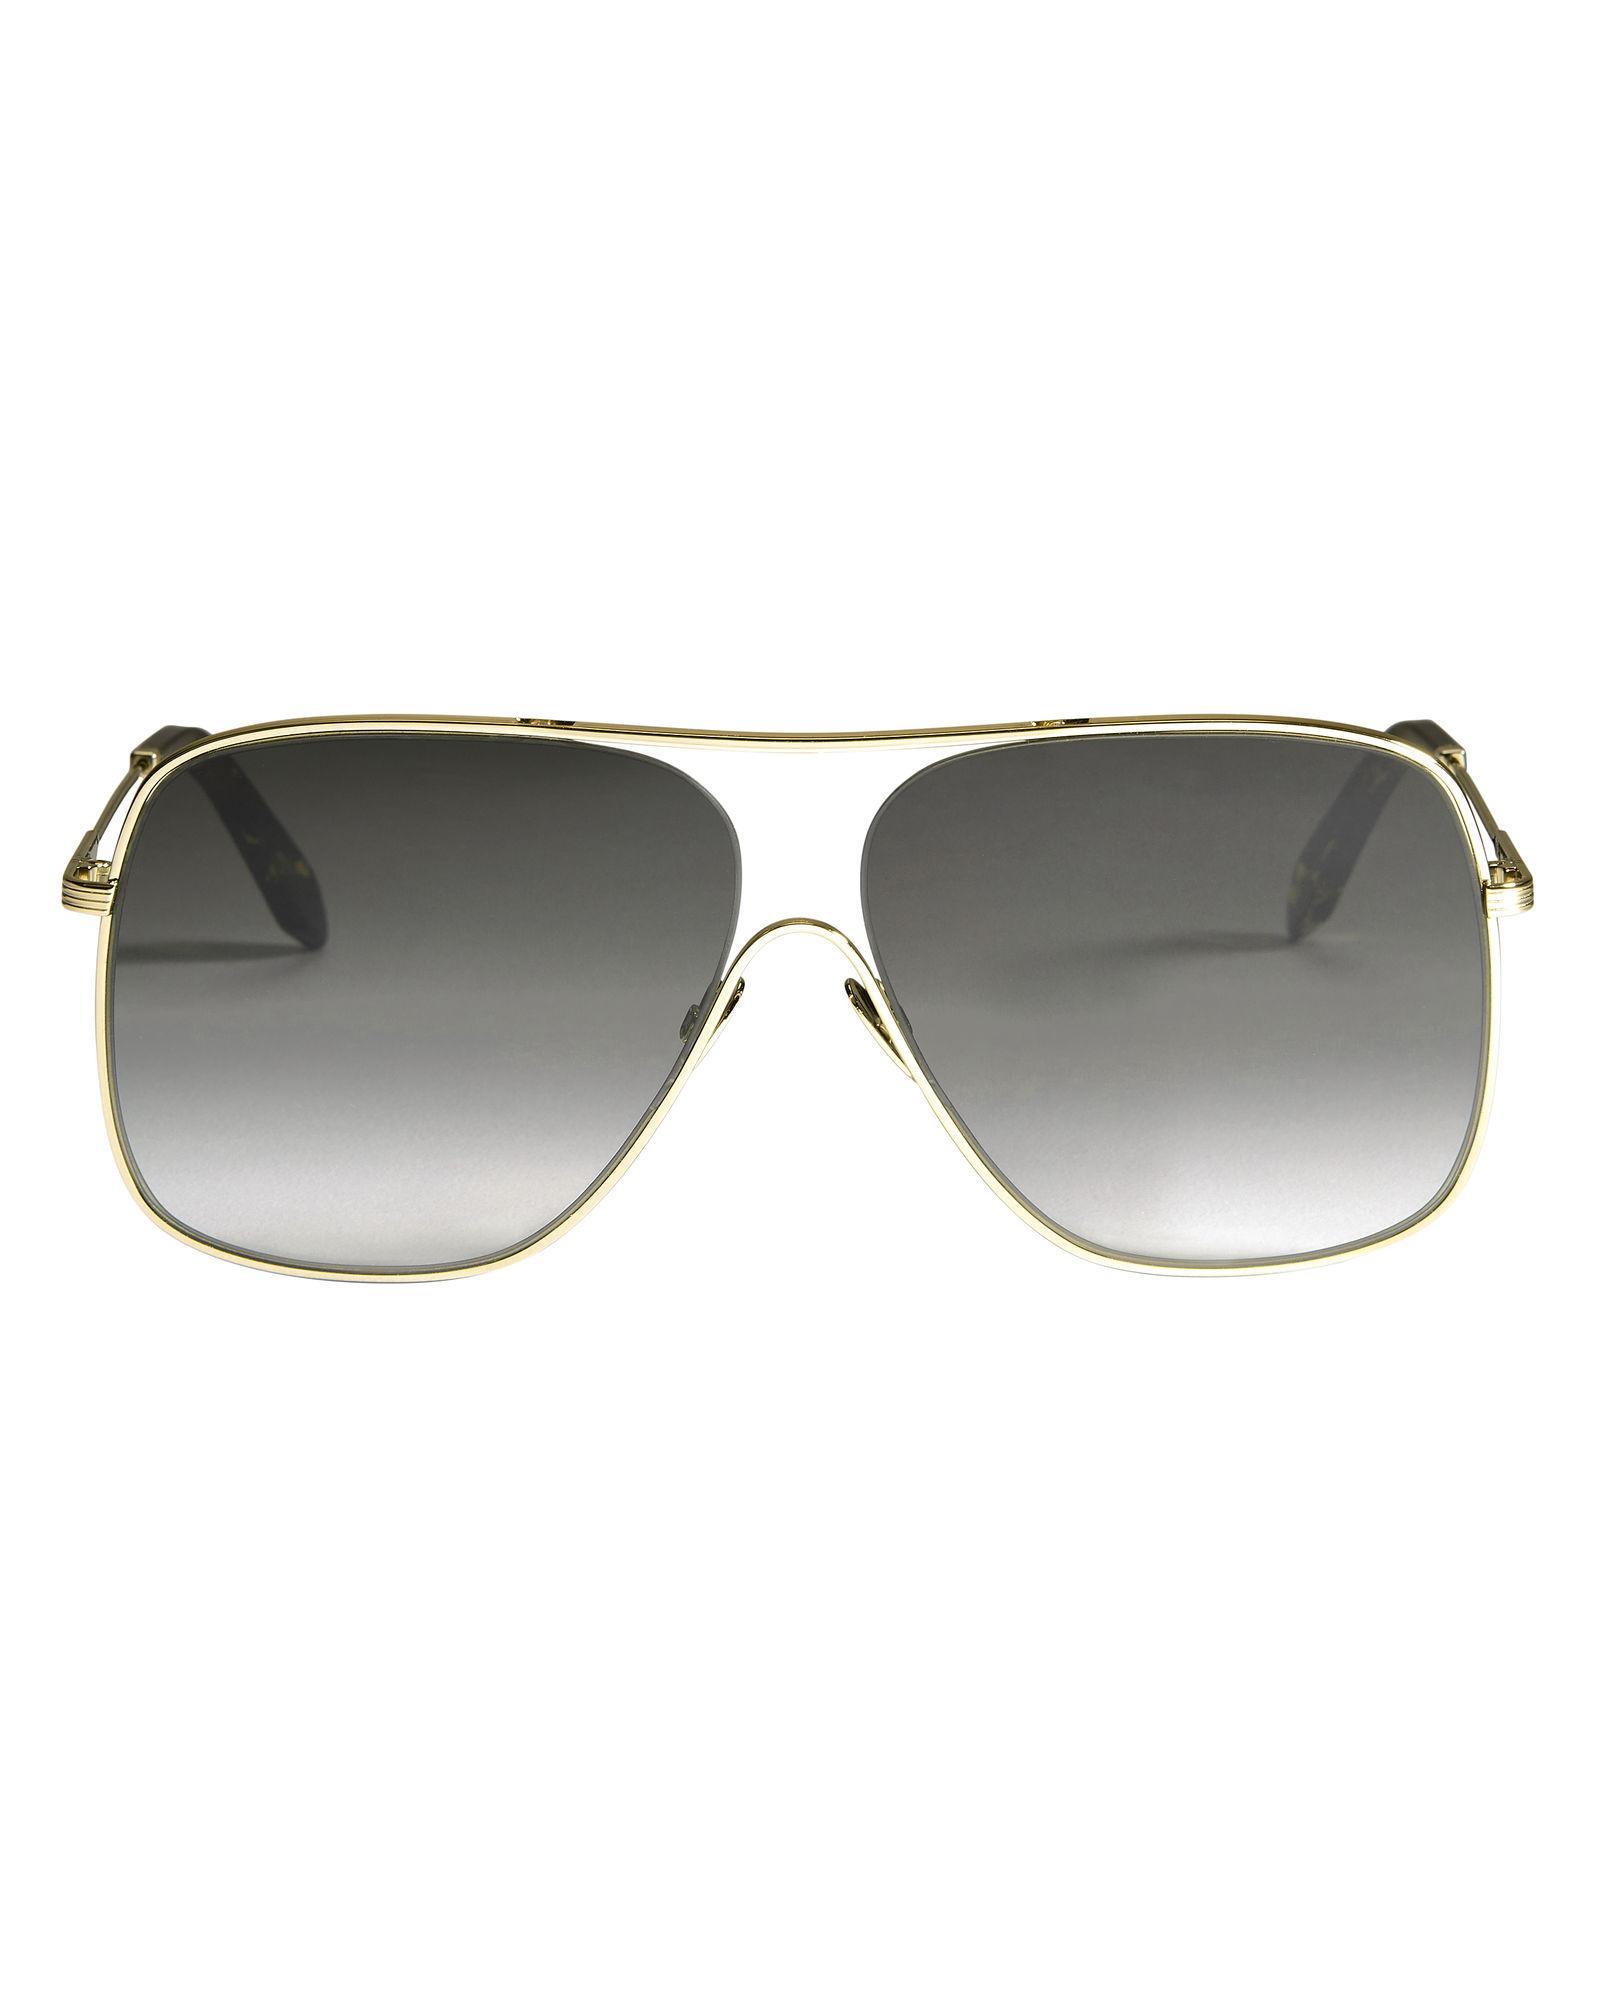 Victoria Beckham Gold Loop Navigator Sunglasses